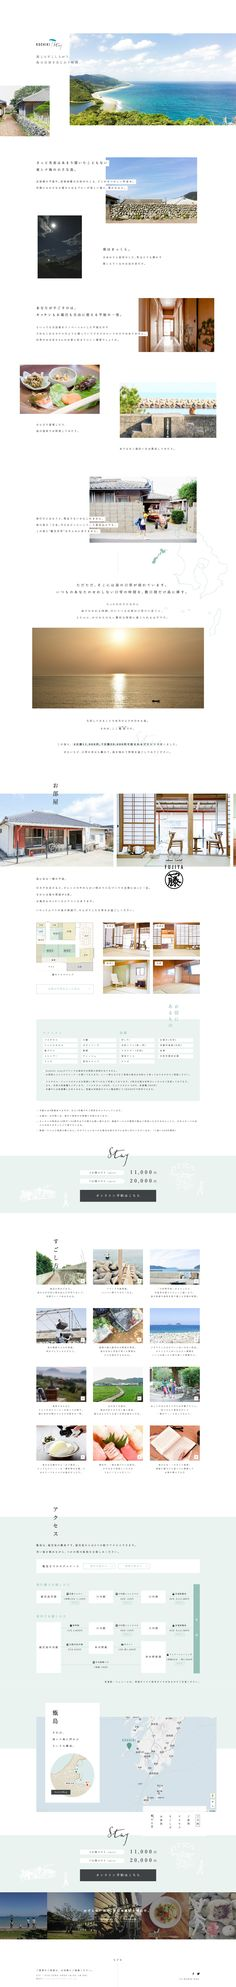 koshikistay  甑島(こしきしま)の日常をあじわう滞在 http://koshiki-stay.jp/